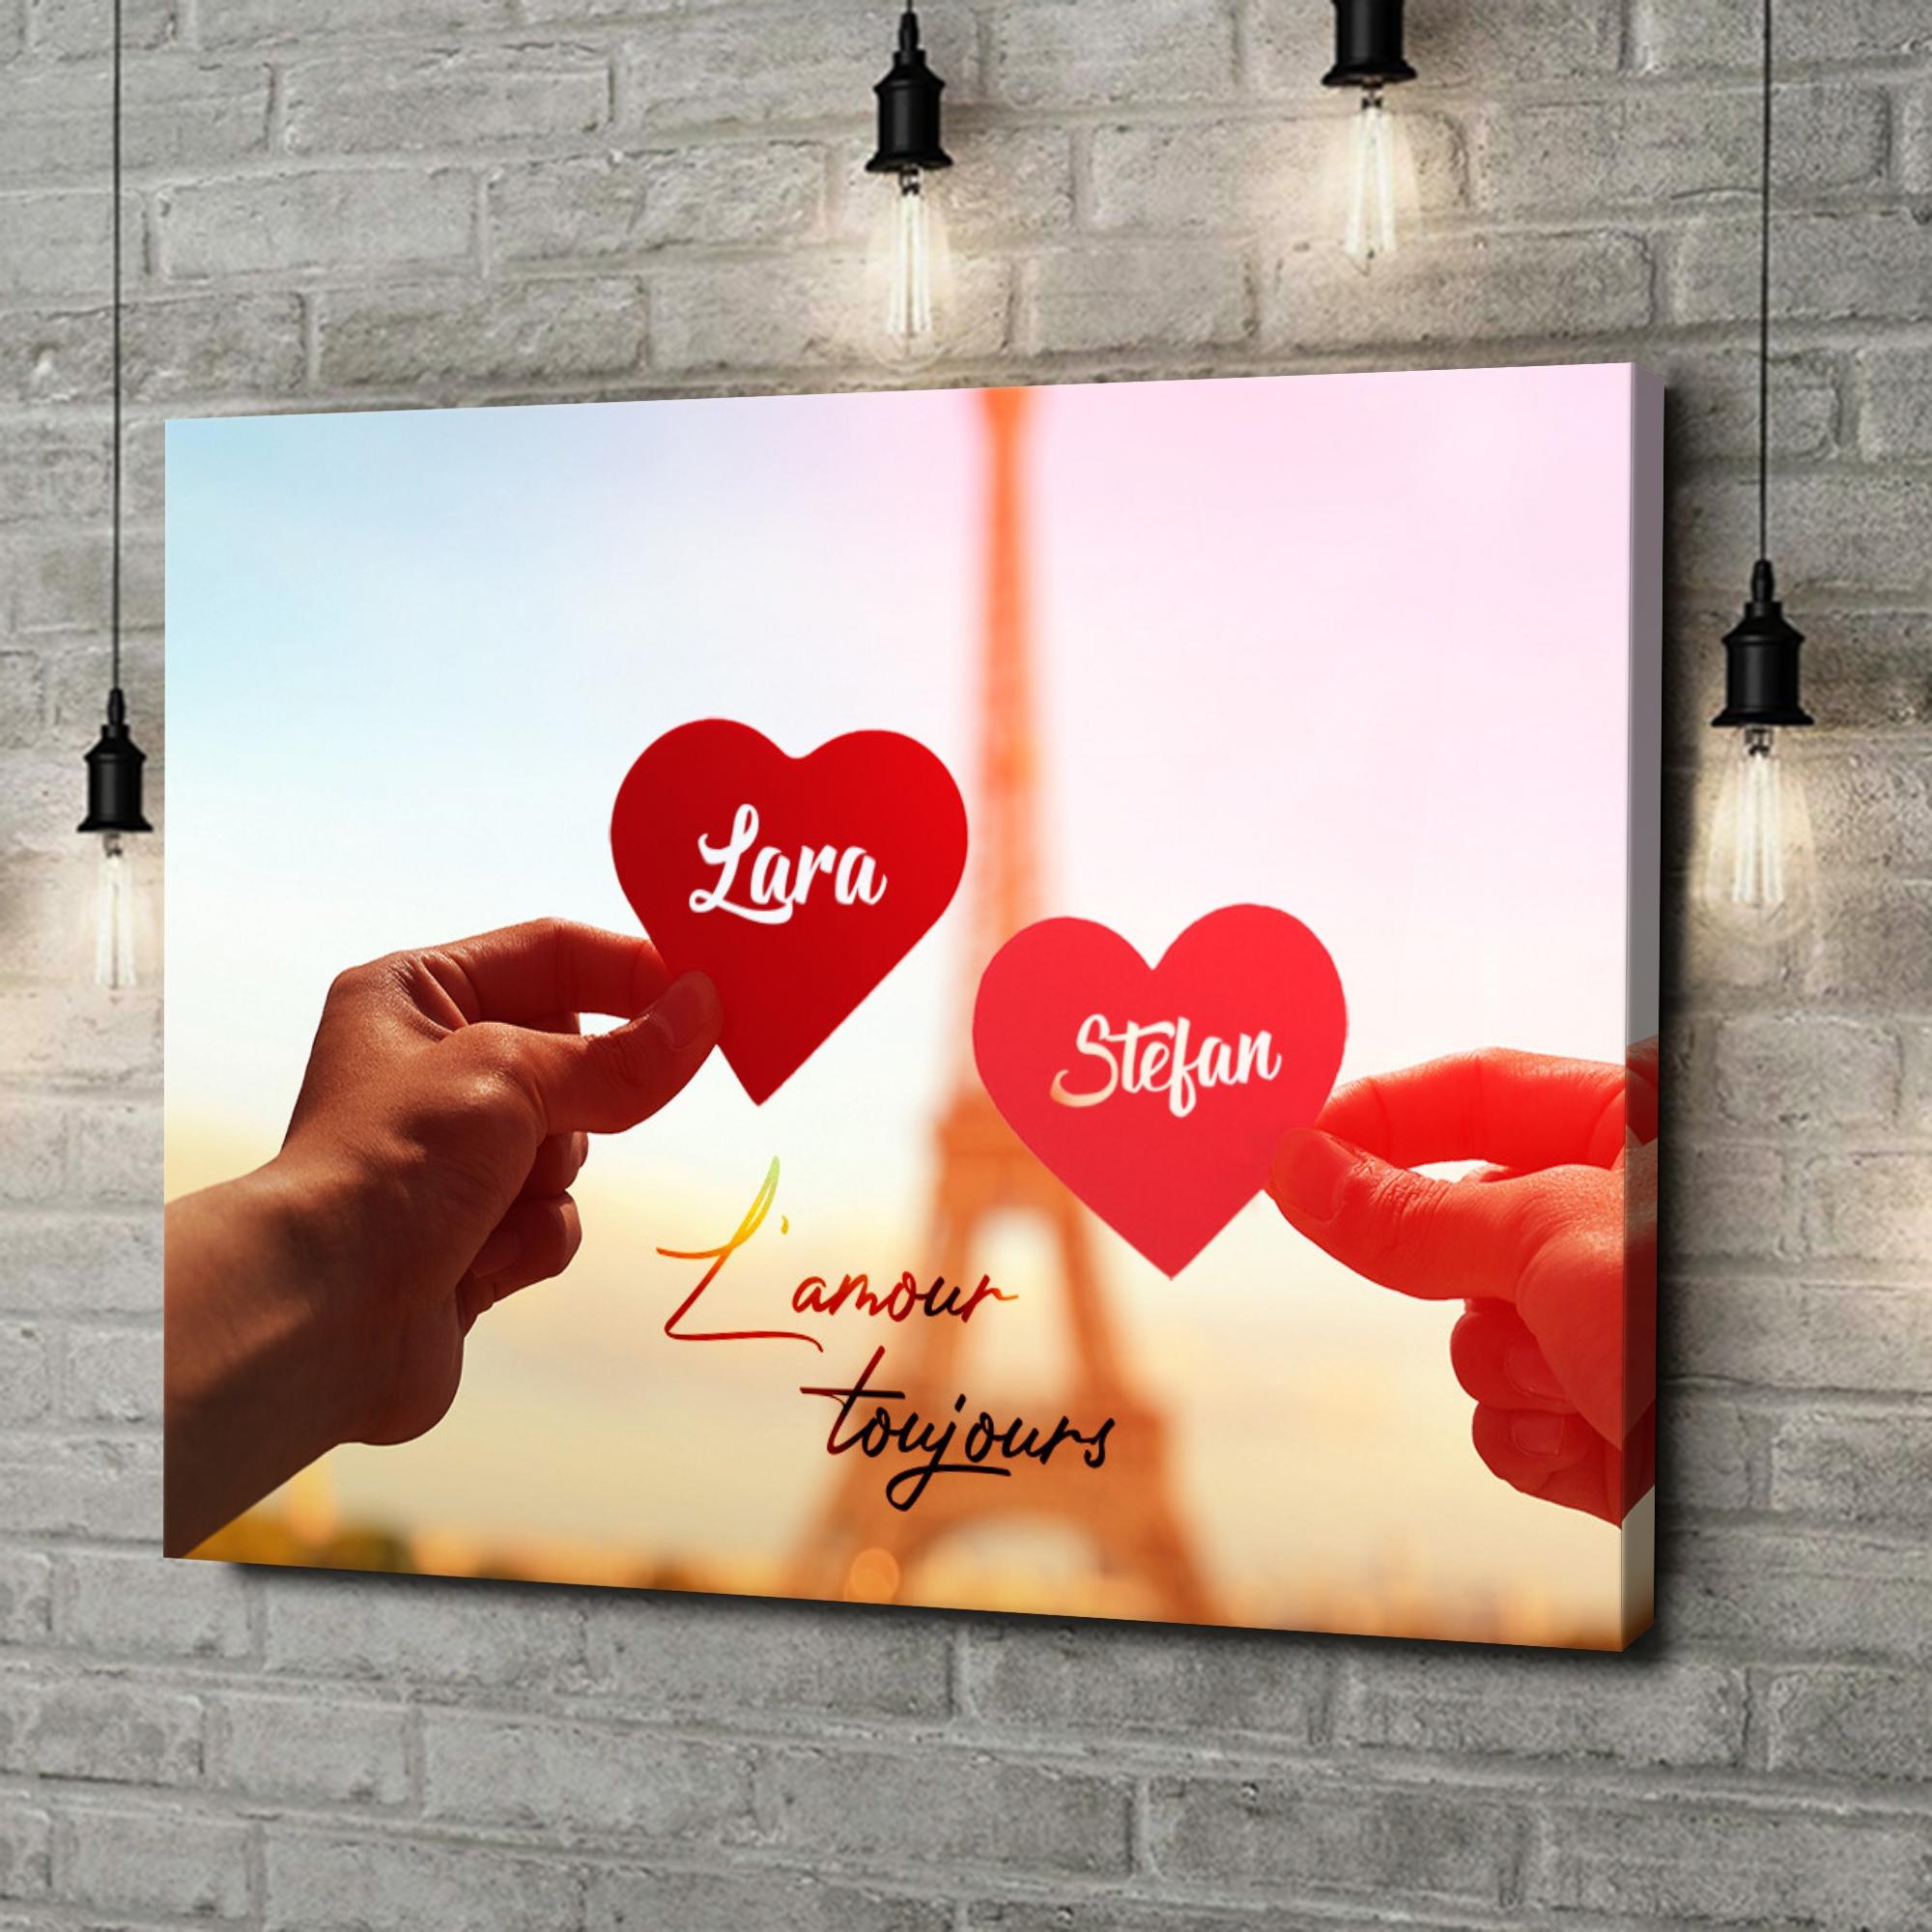 Leinwandbild personalisiert L'amour Toujours